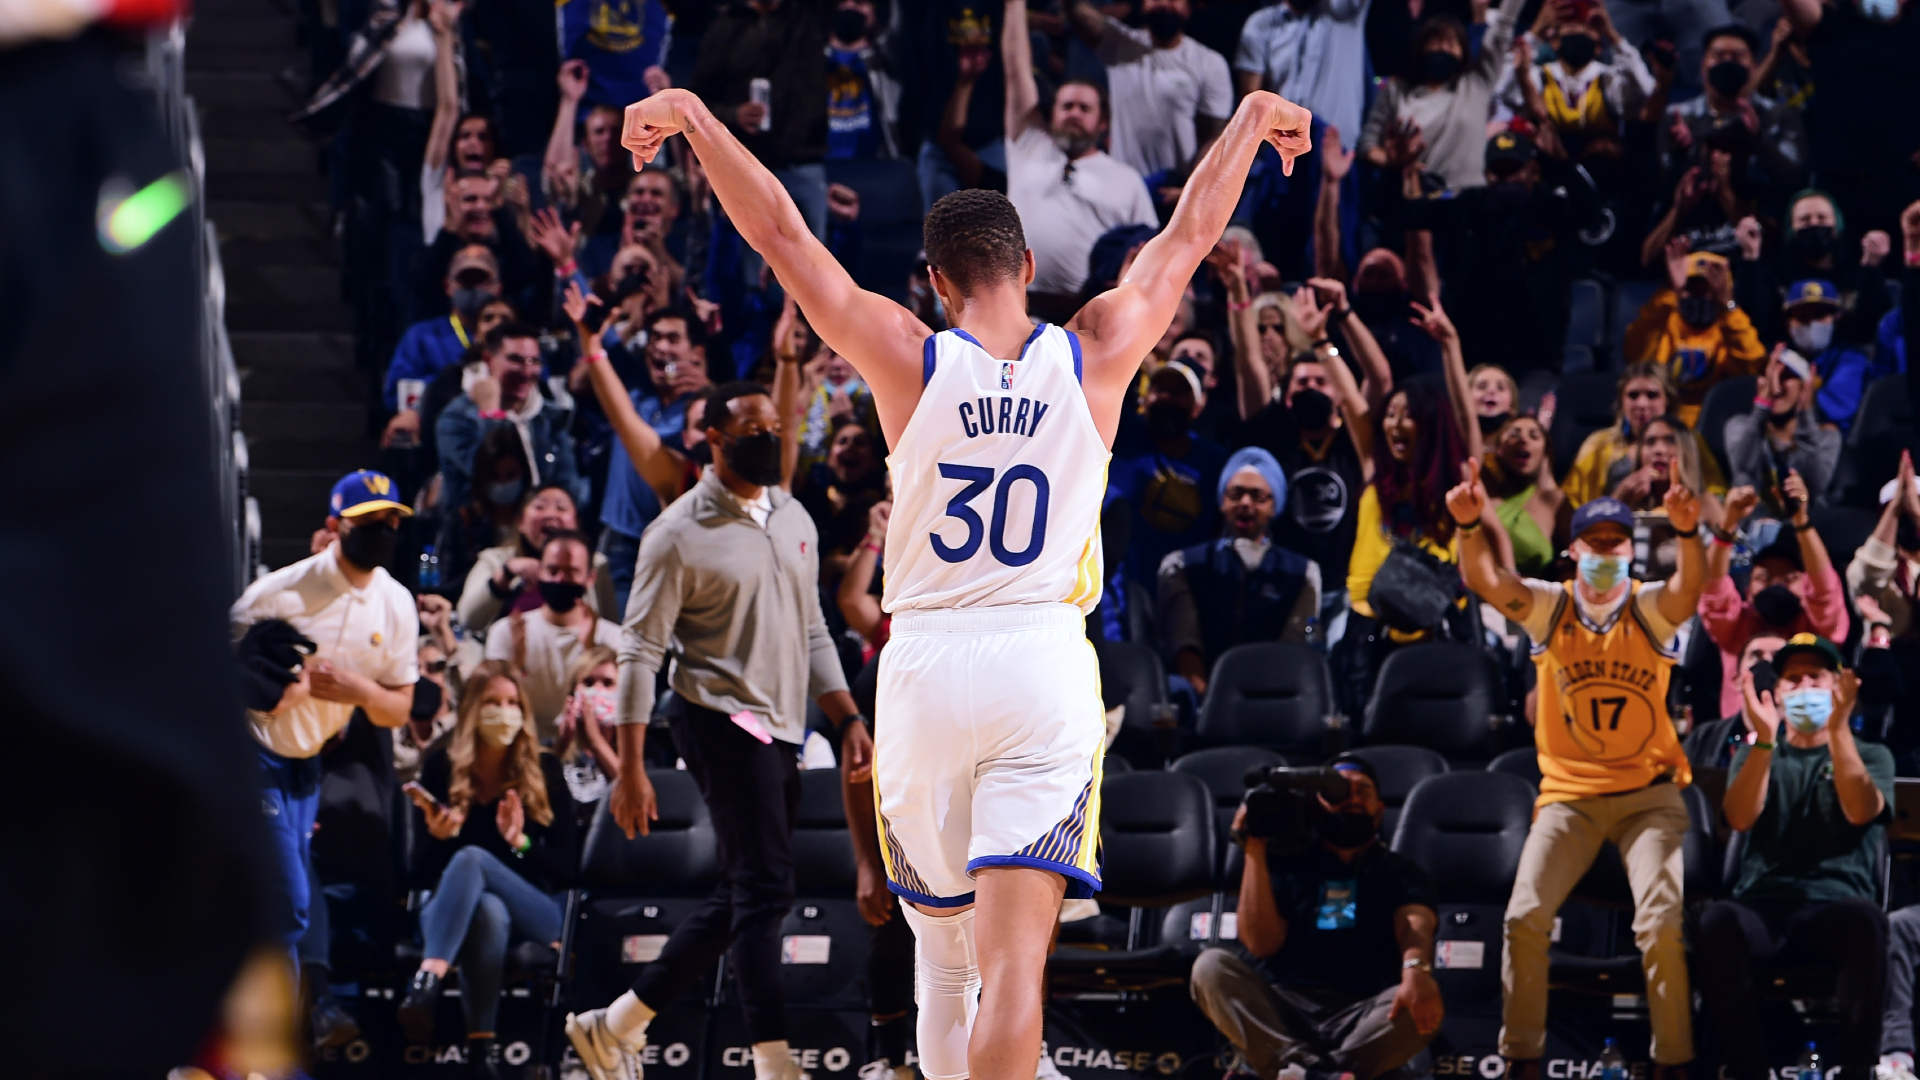 Midseason form: Curry shreds Blazers in preseason finale